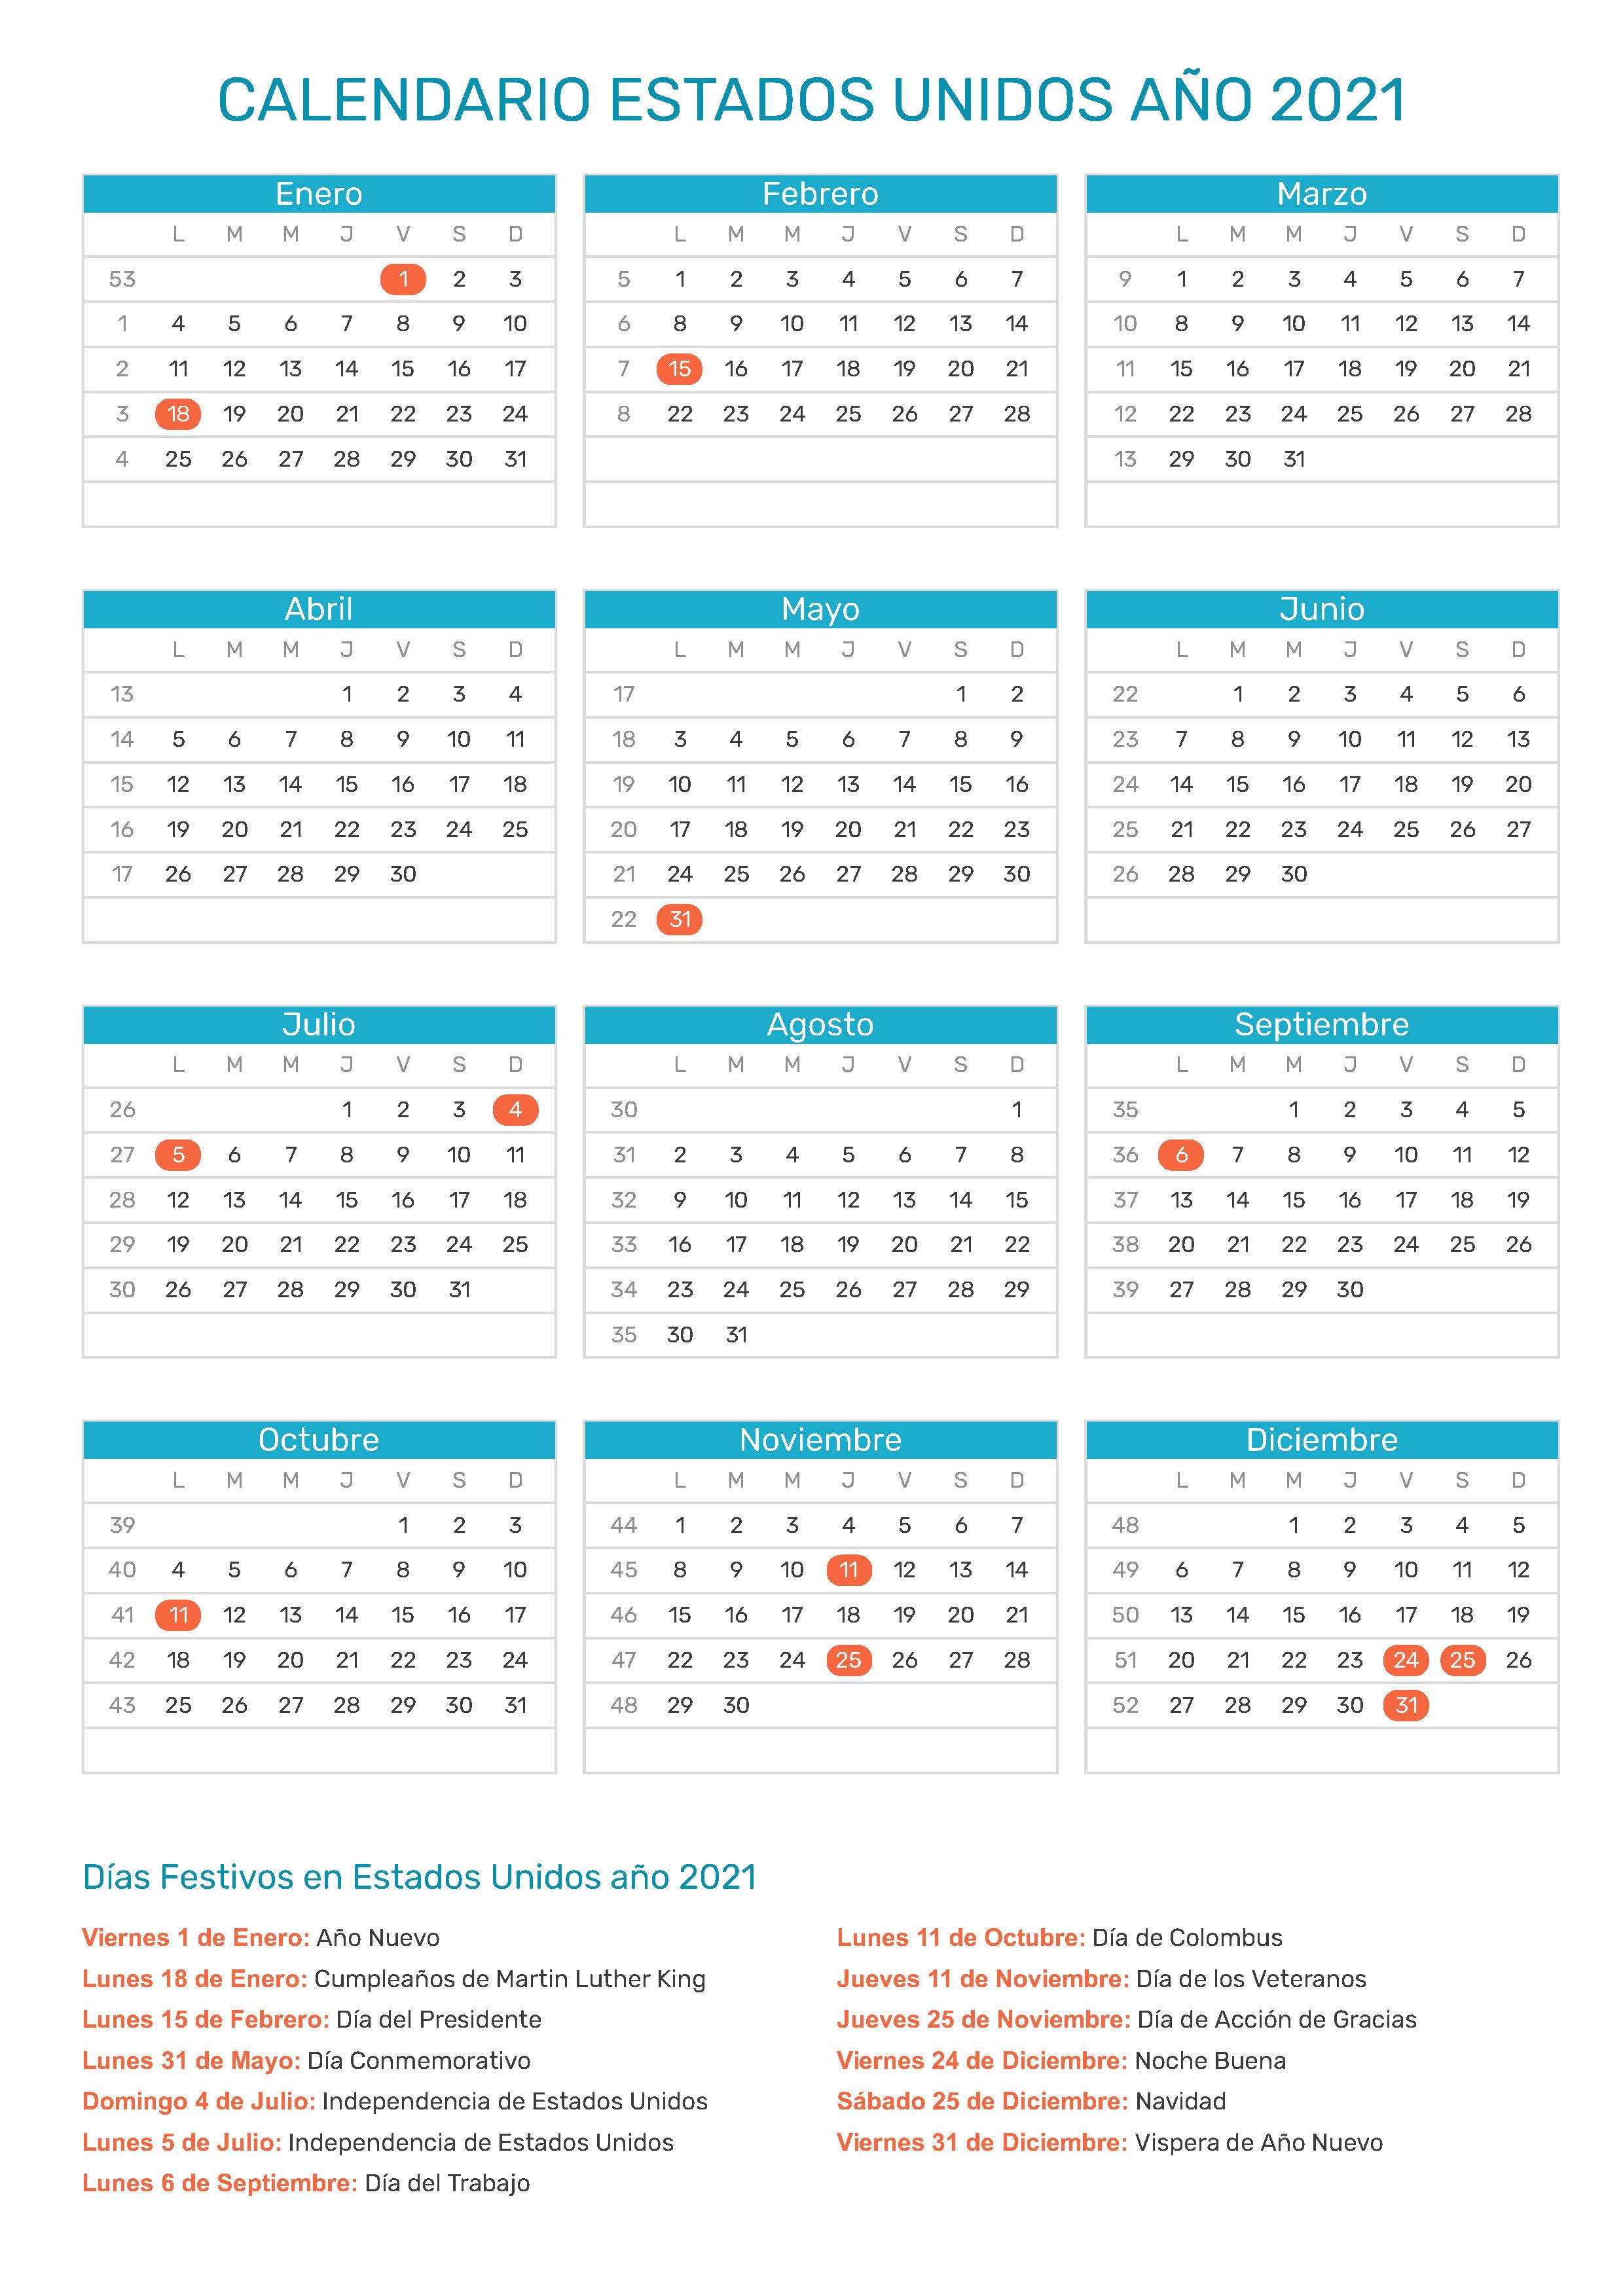 Calendario Estados Unidos Ano 2021 Dias Festivos